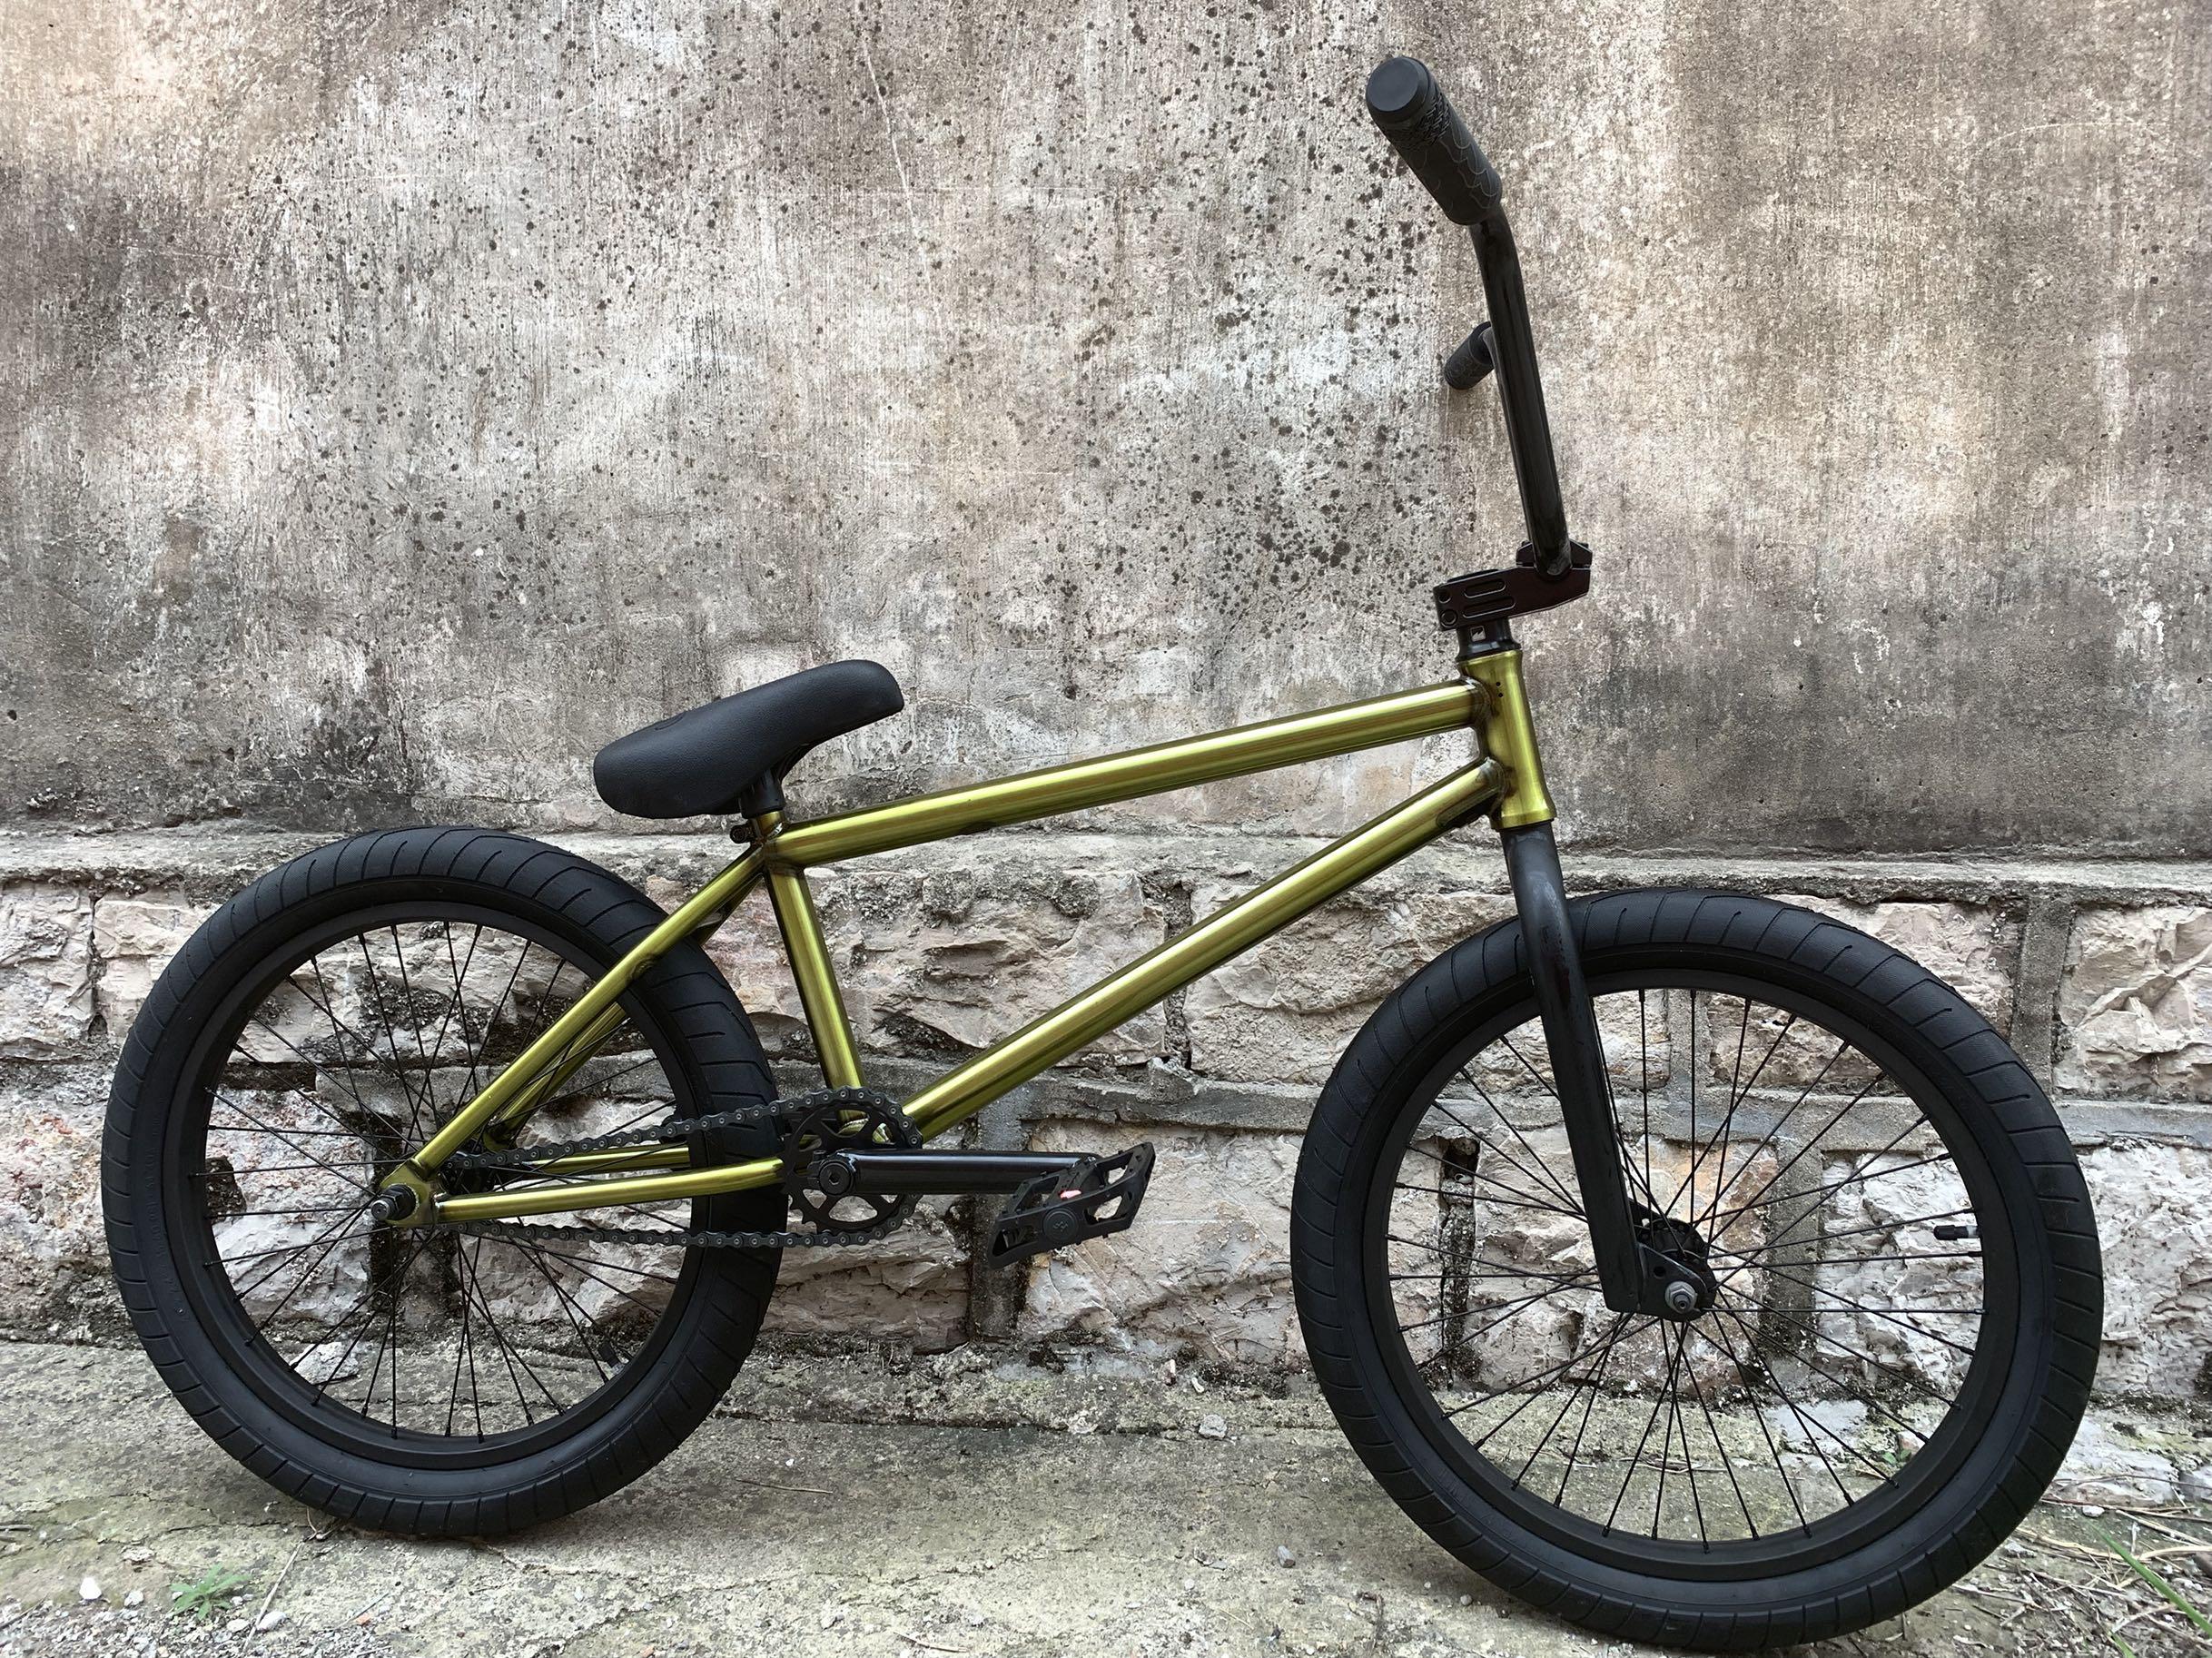 Kink Frame Diy Bmx Bike